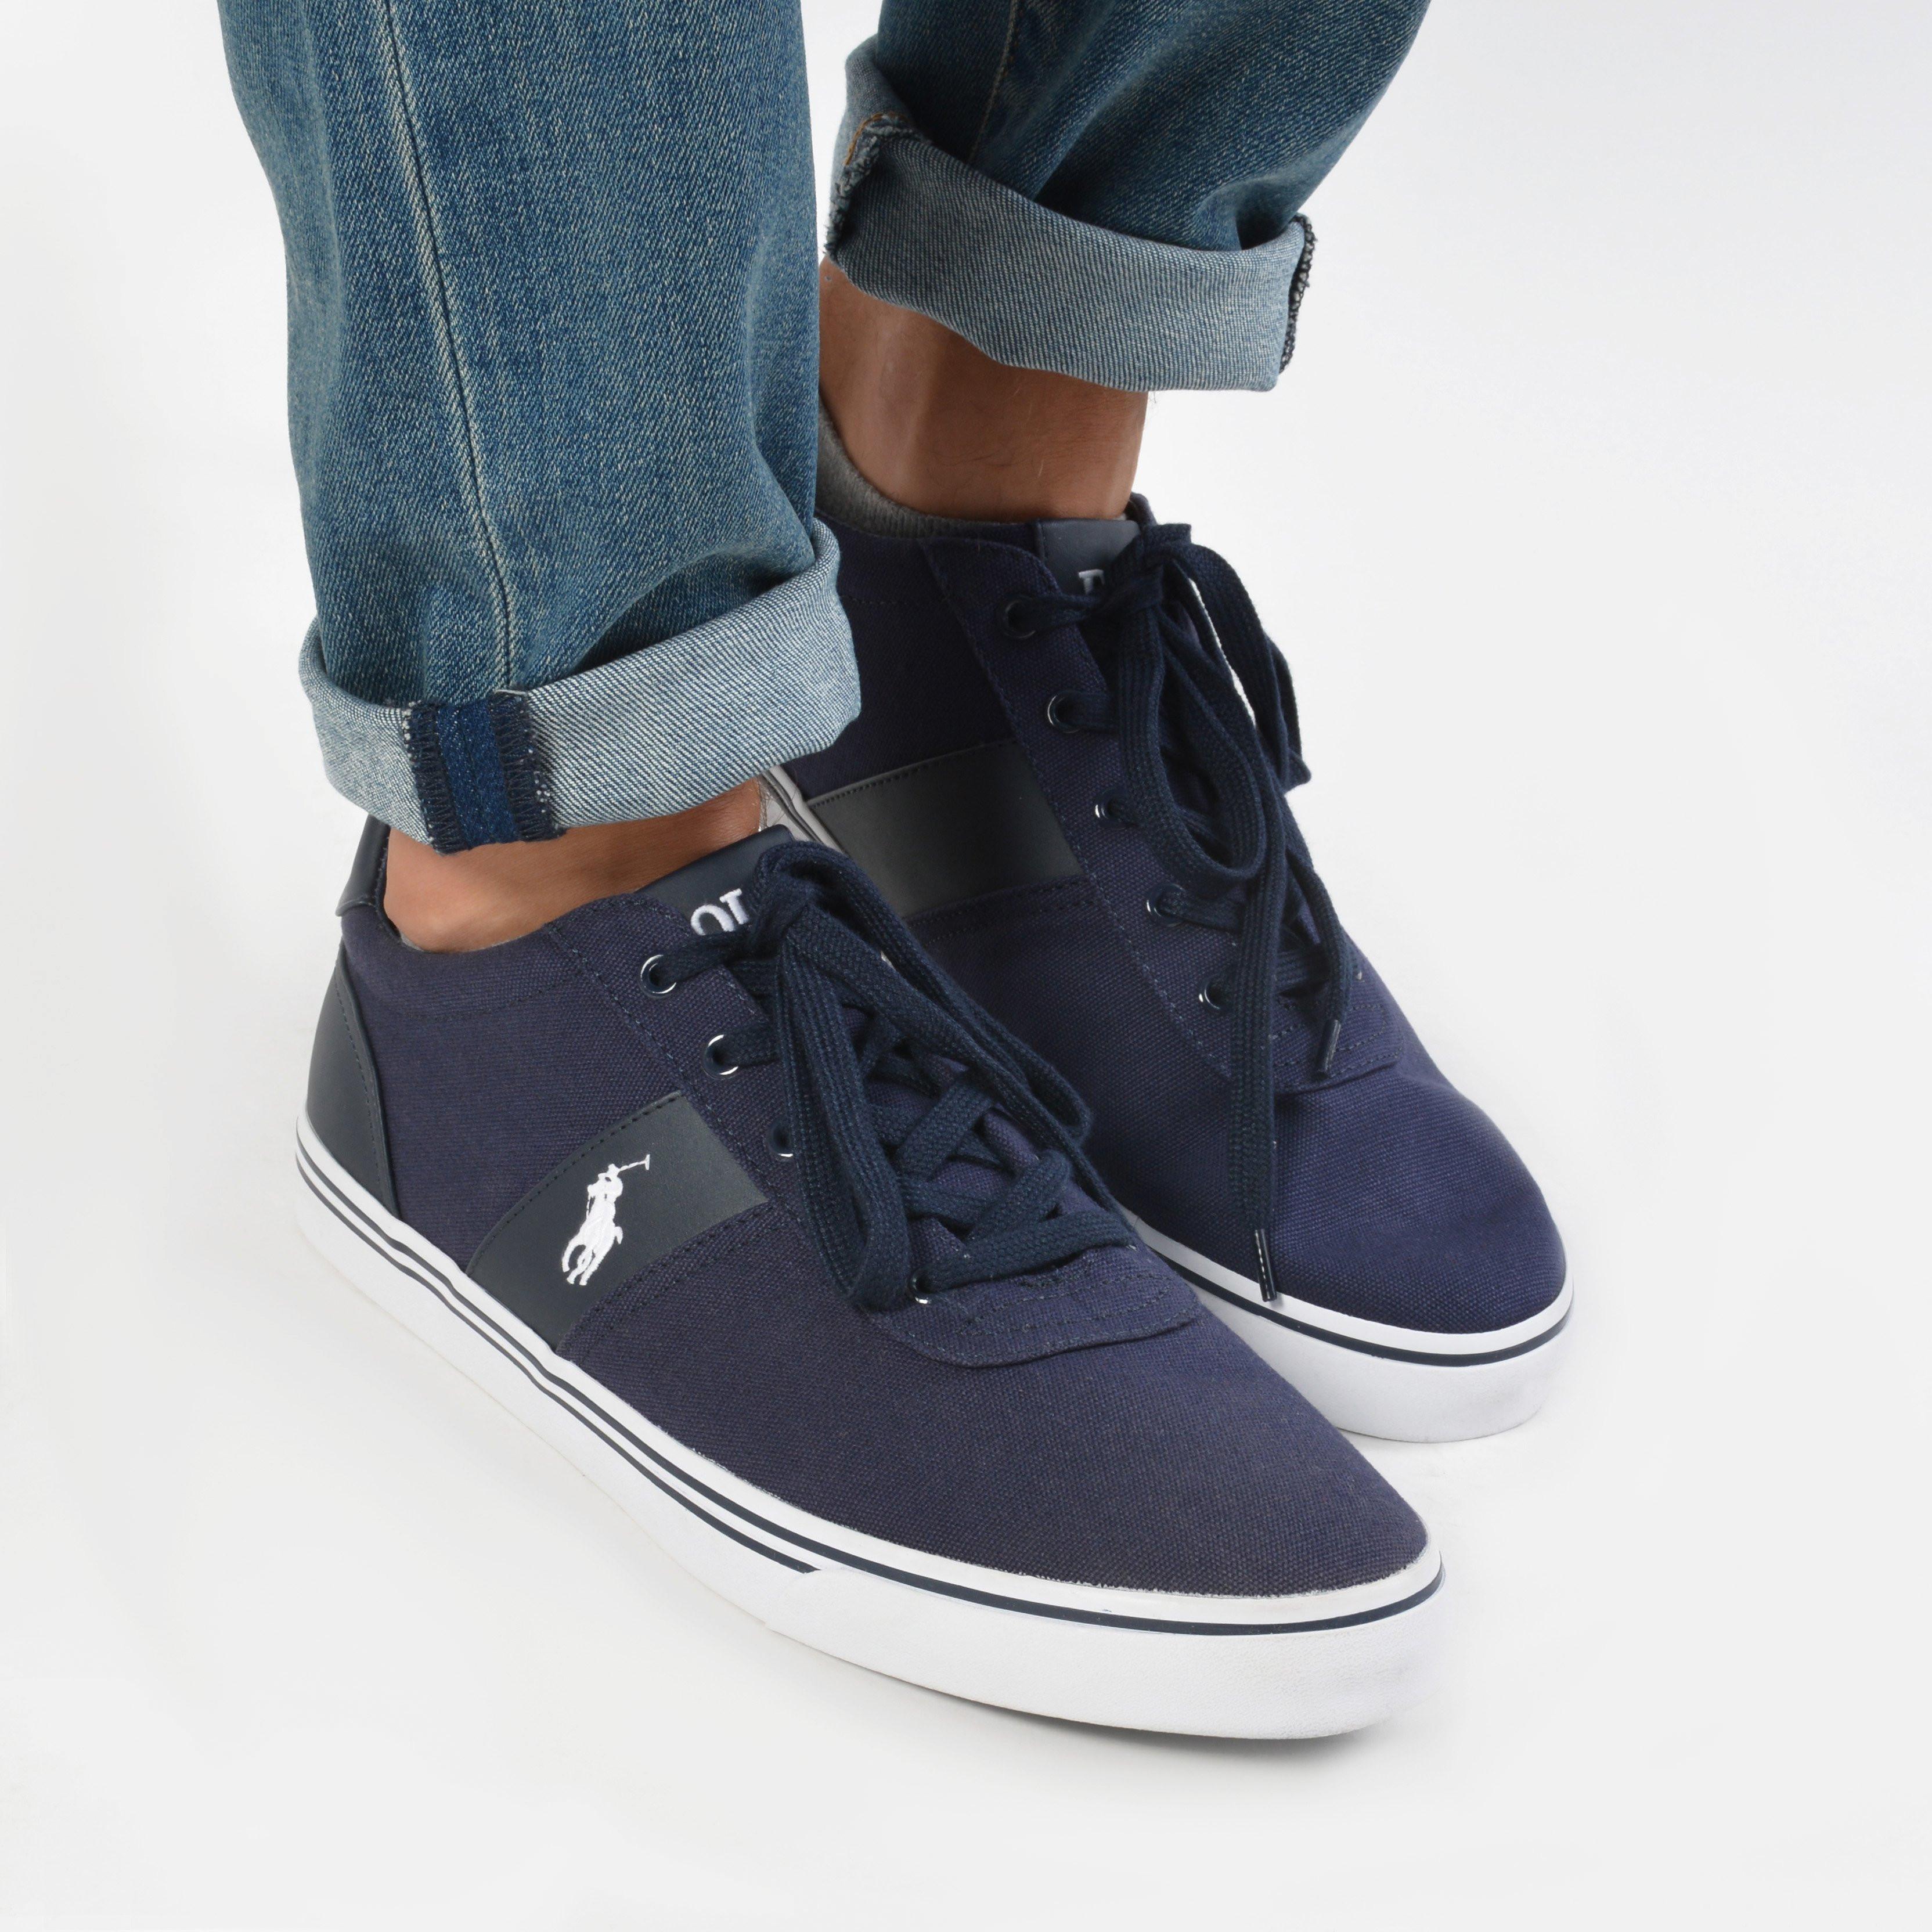 Polo Ralph Lauren Hanford Ανδρικά Παπούτσια (10800109335_23590)